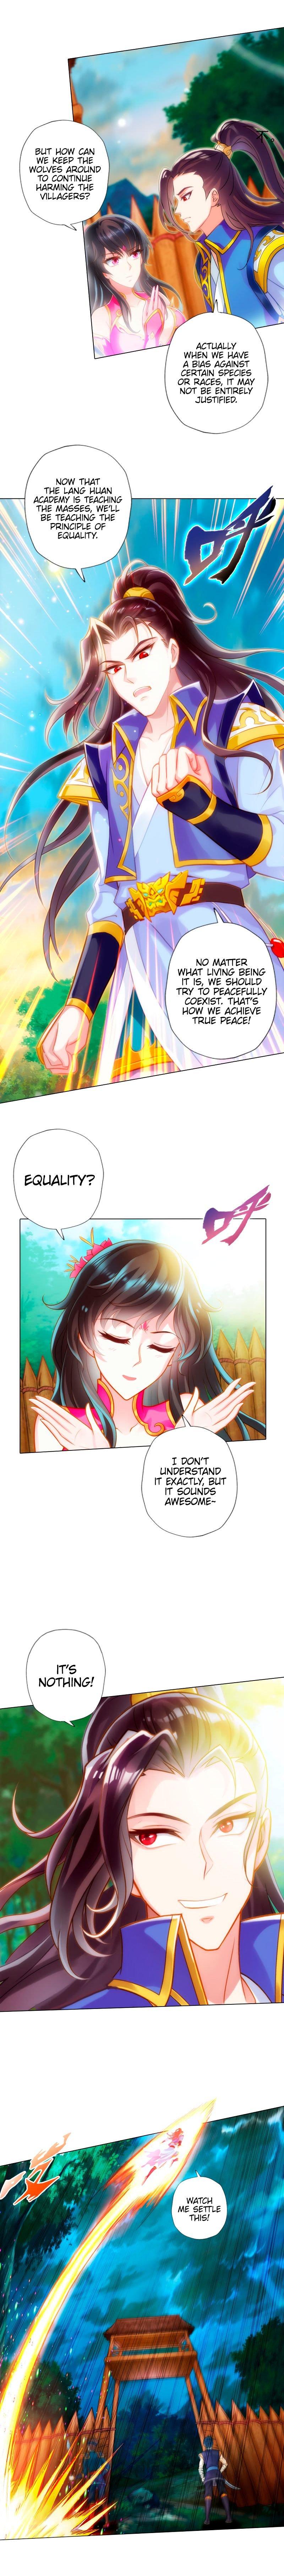 Manga Lang Huan Library - Chapter 82 Page 9